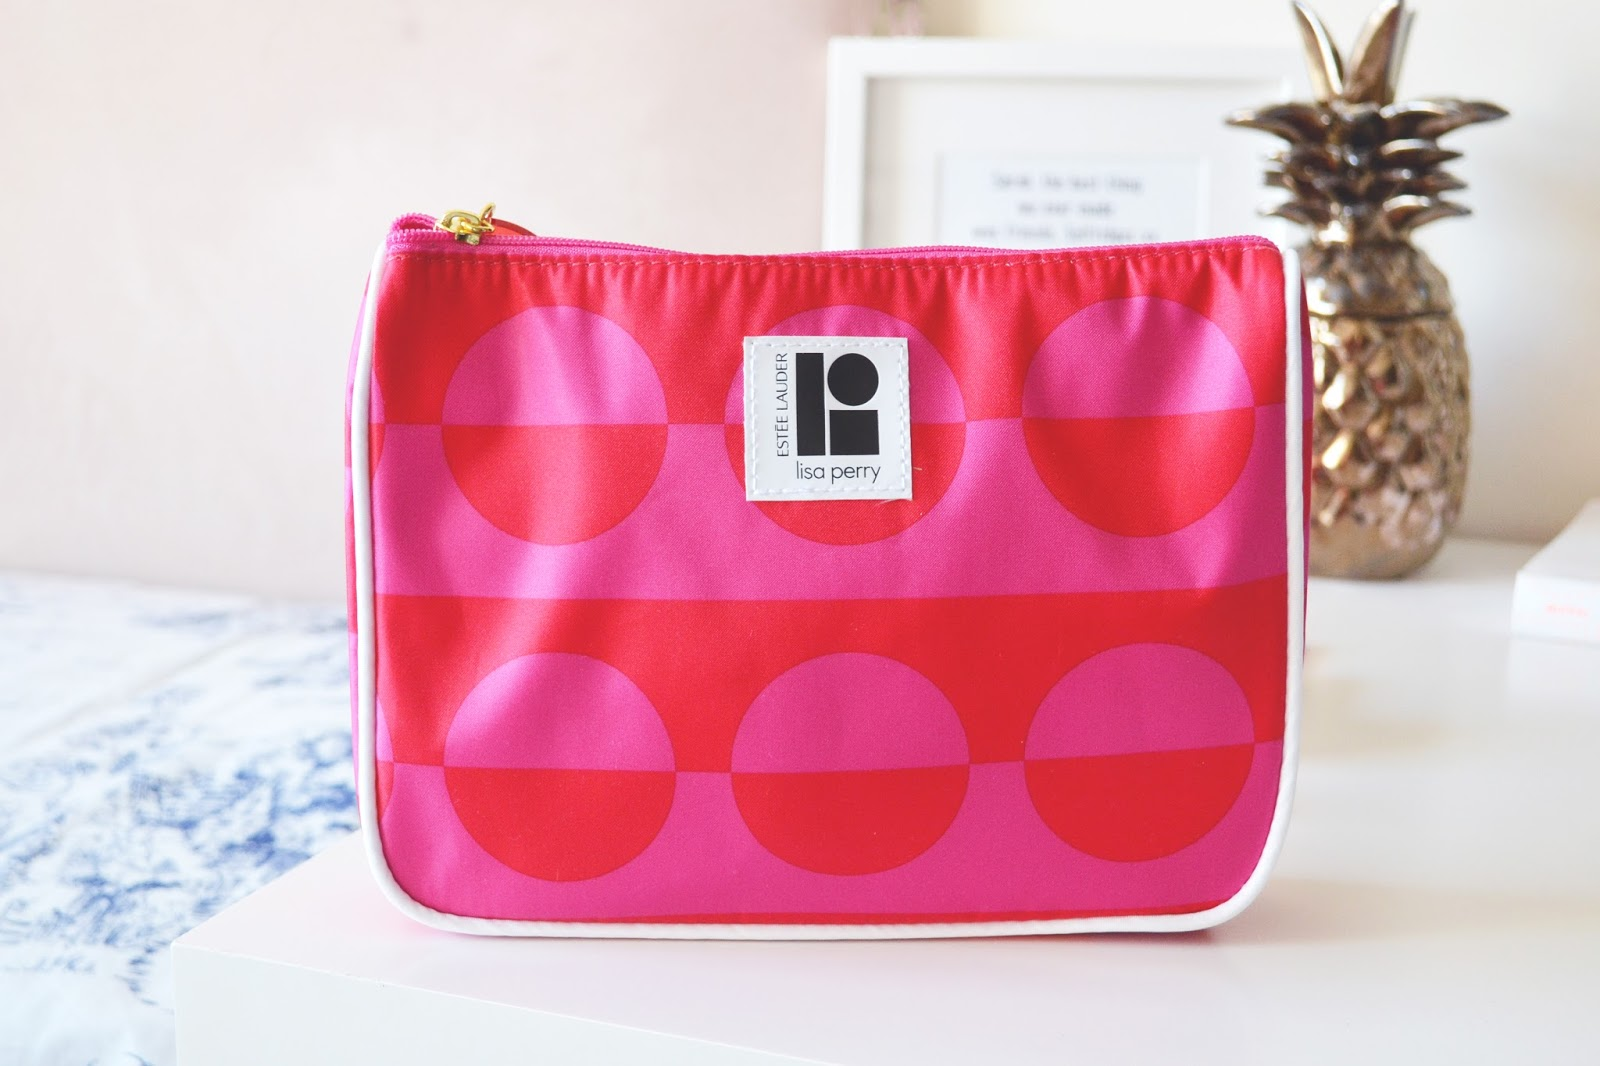 estee lauder lisa perry, pink make up bag